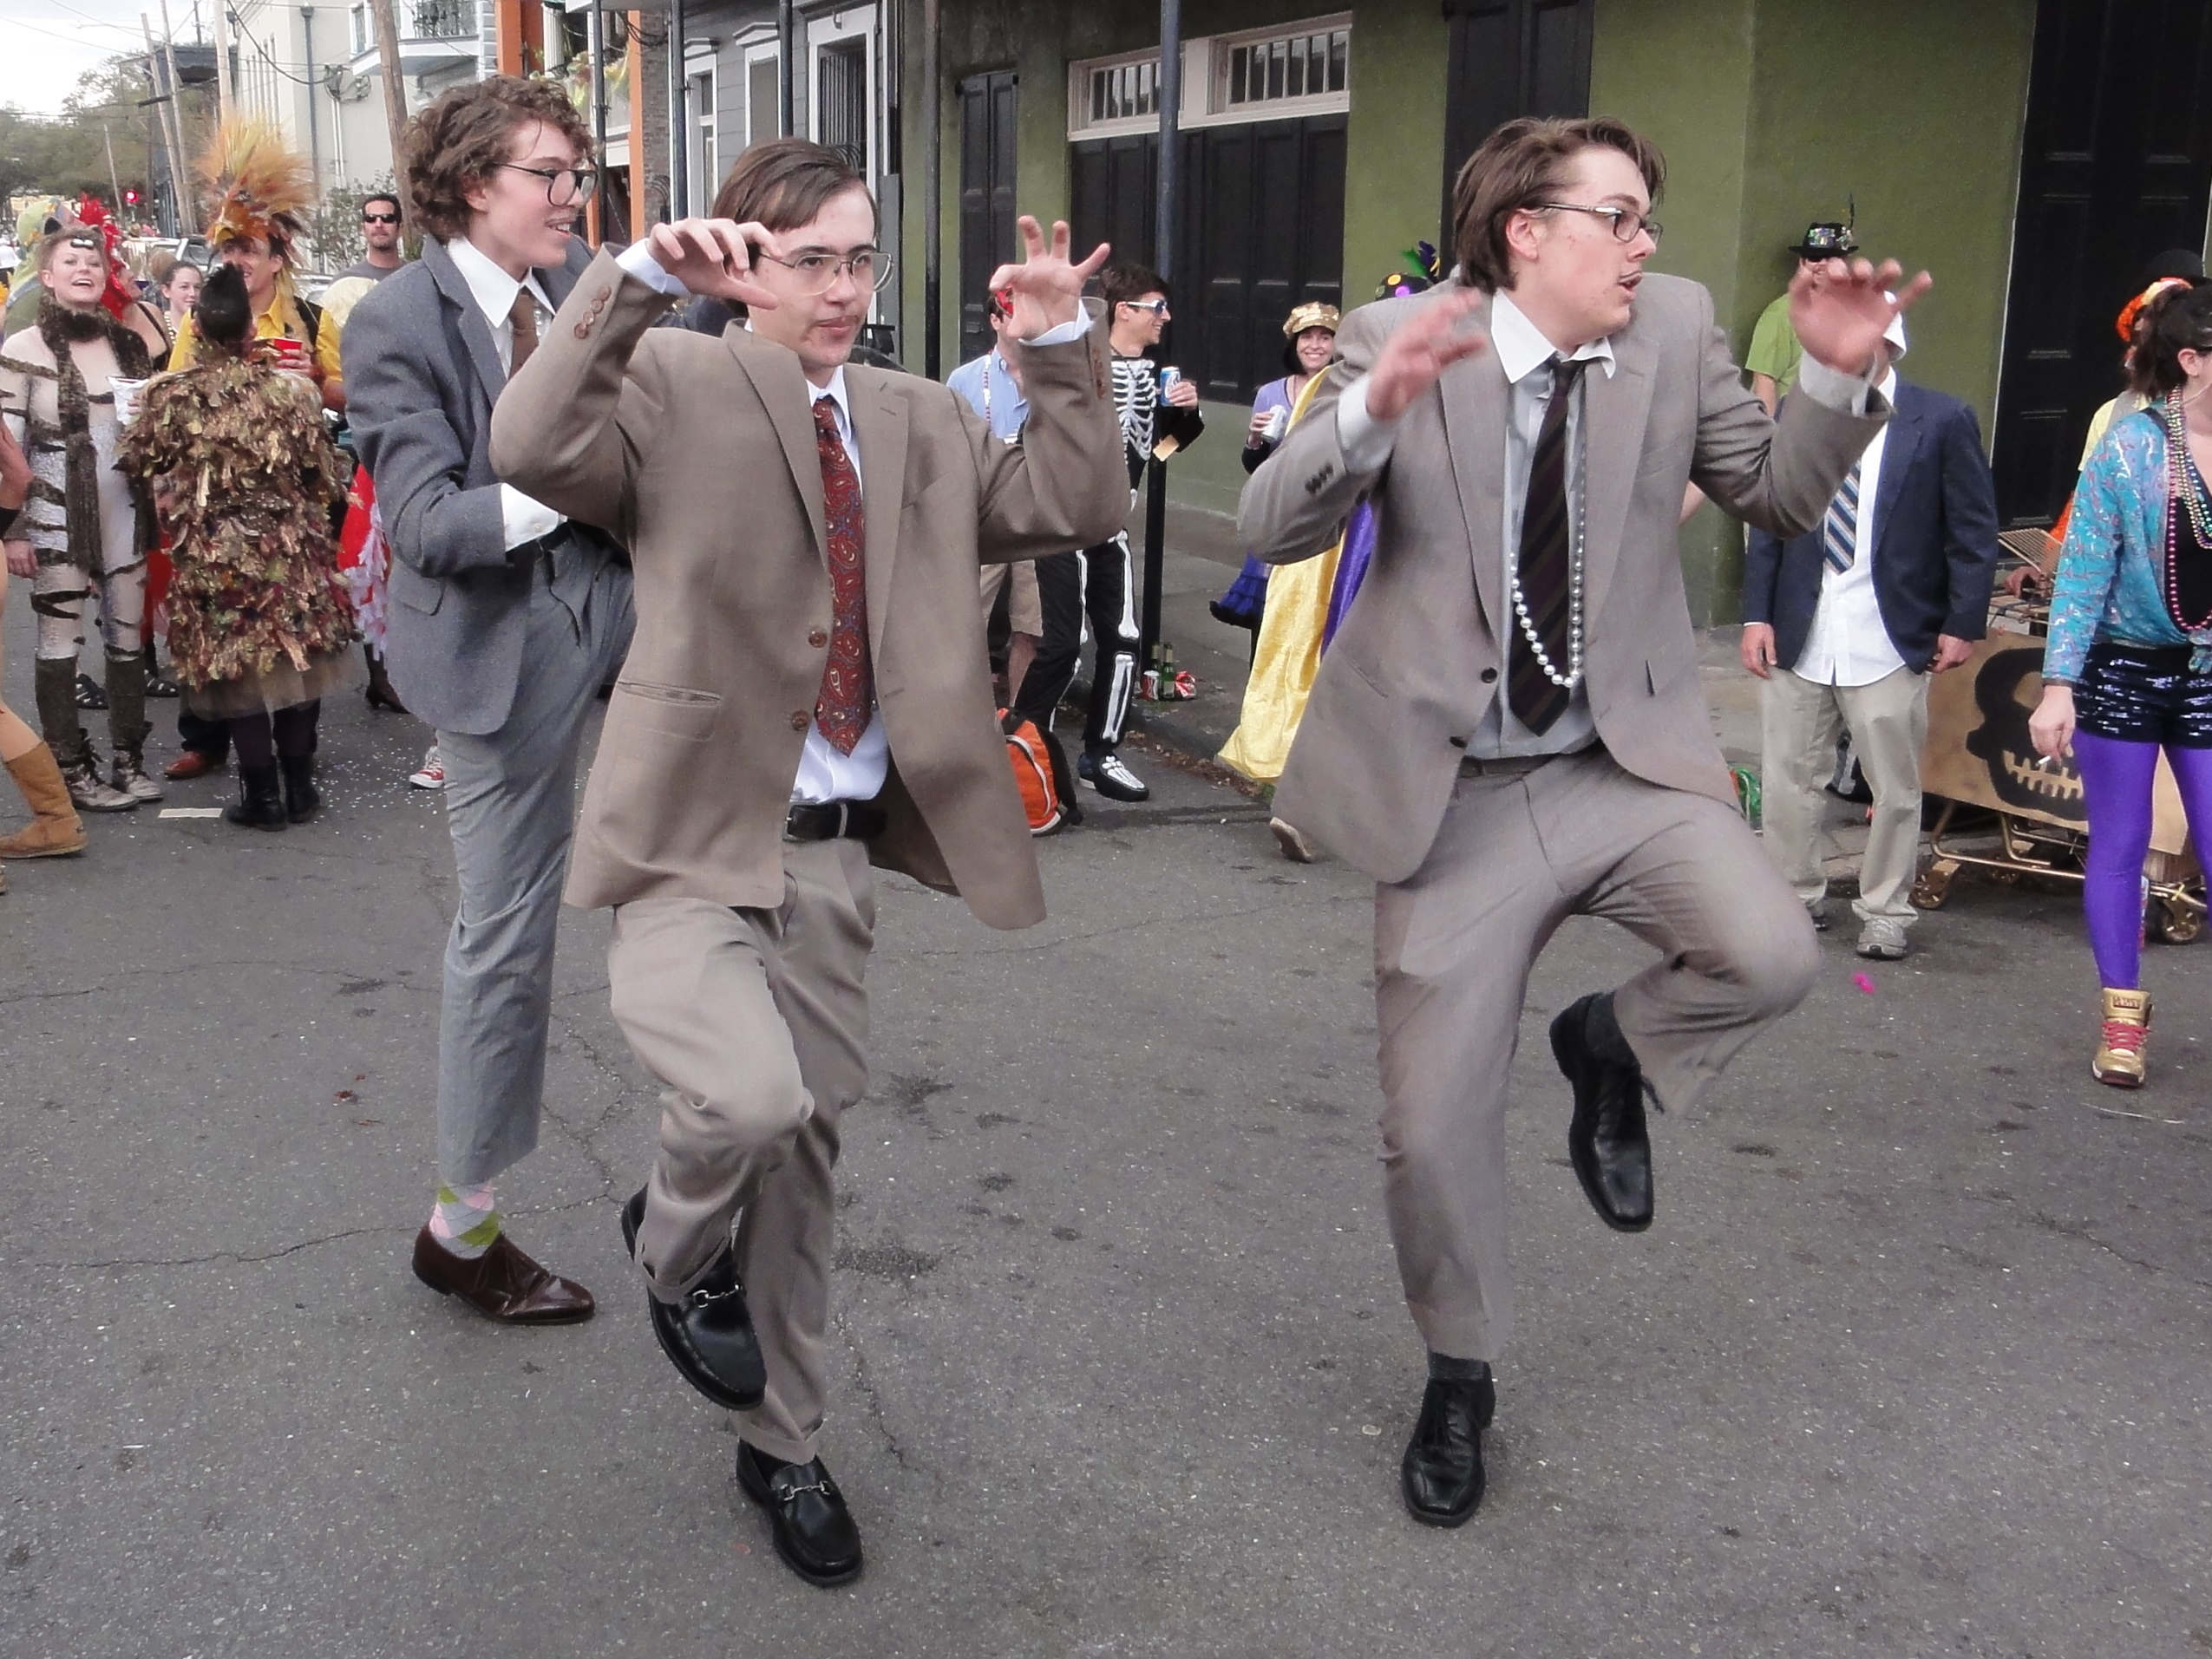 Description The Creep New Orleans Mardi Gras.jpg